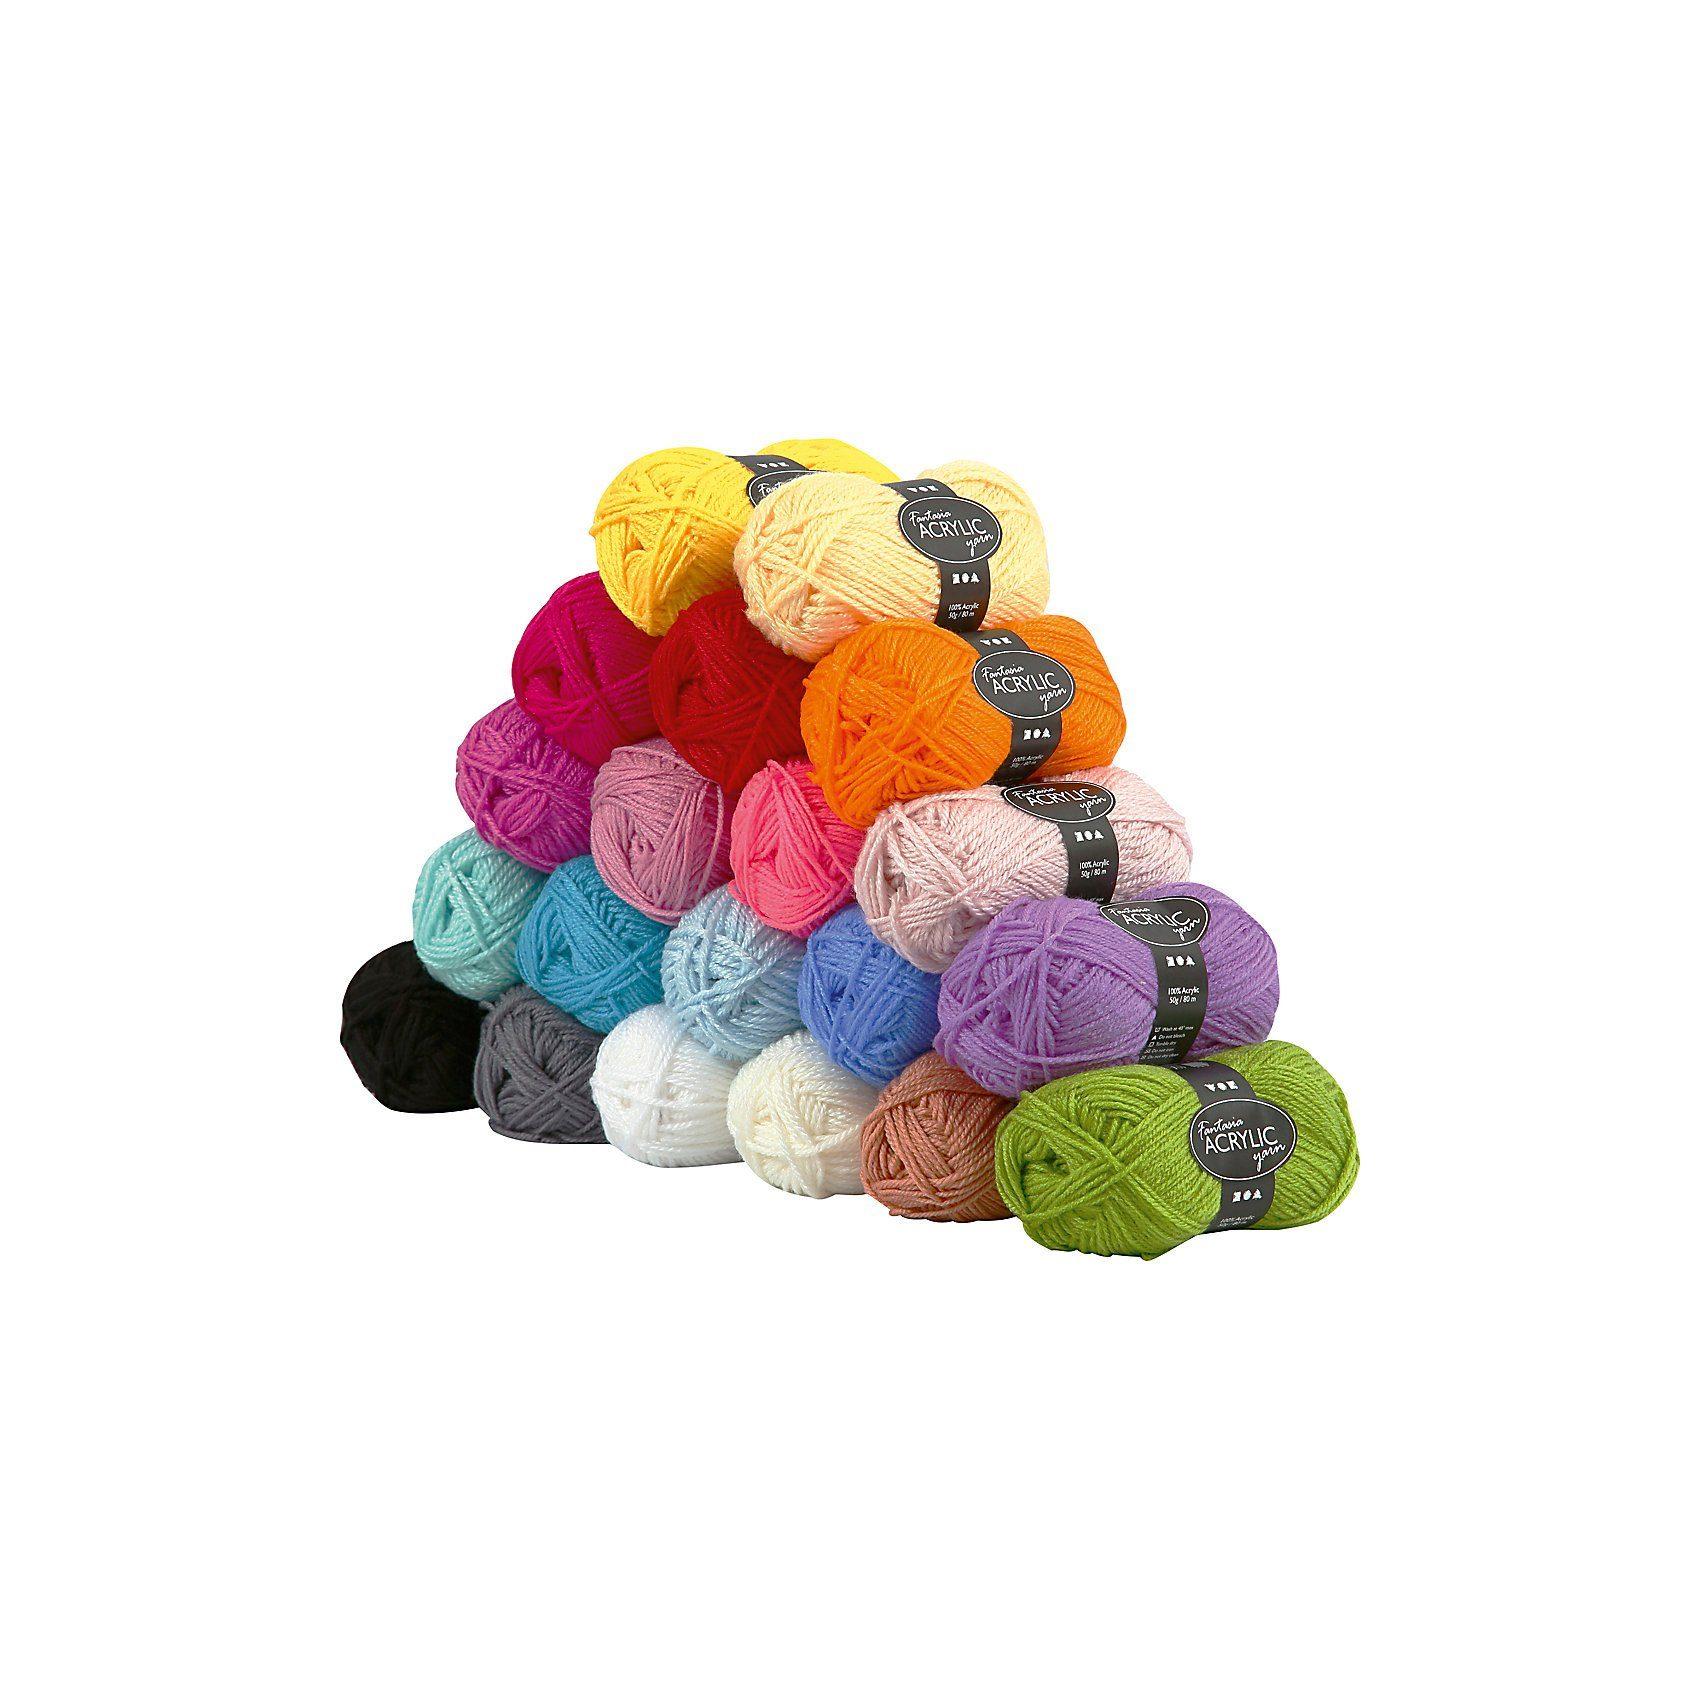 Fantasia Acryl-Wolle, L: 80 m, Sortierte Farben, 20x50g